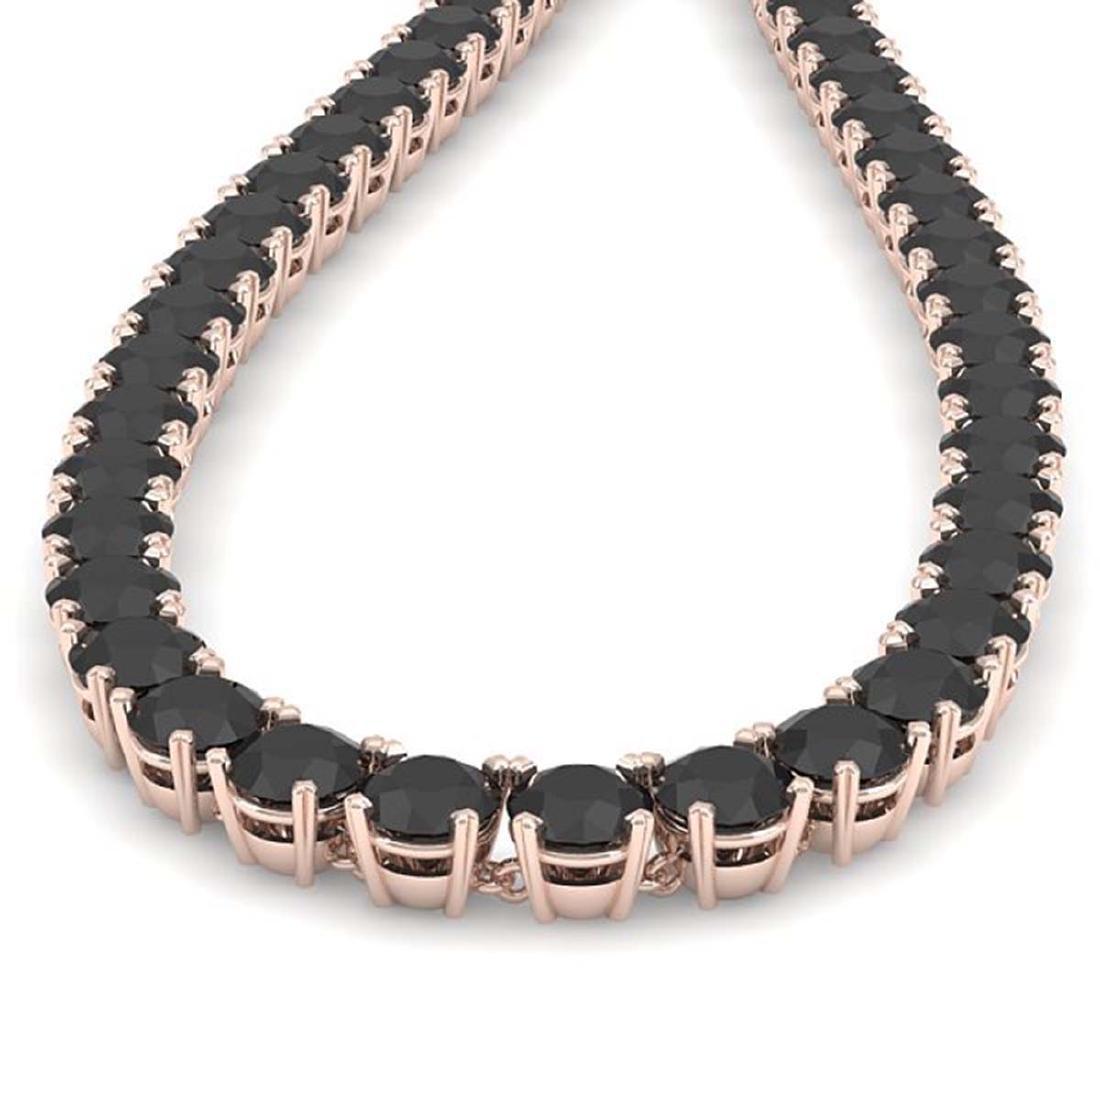 40 CTW Certified Black VS Diamond Necklace 14K Rose - 2